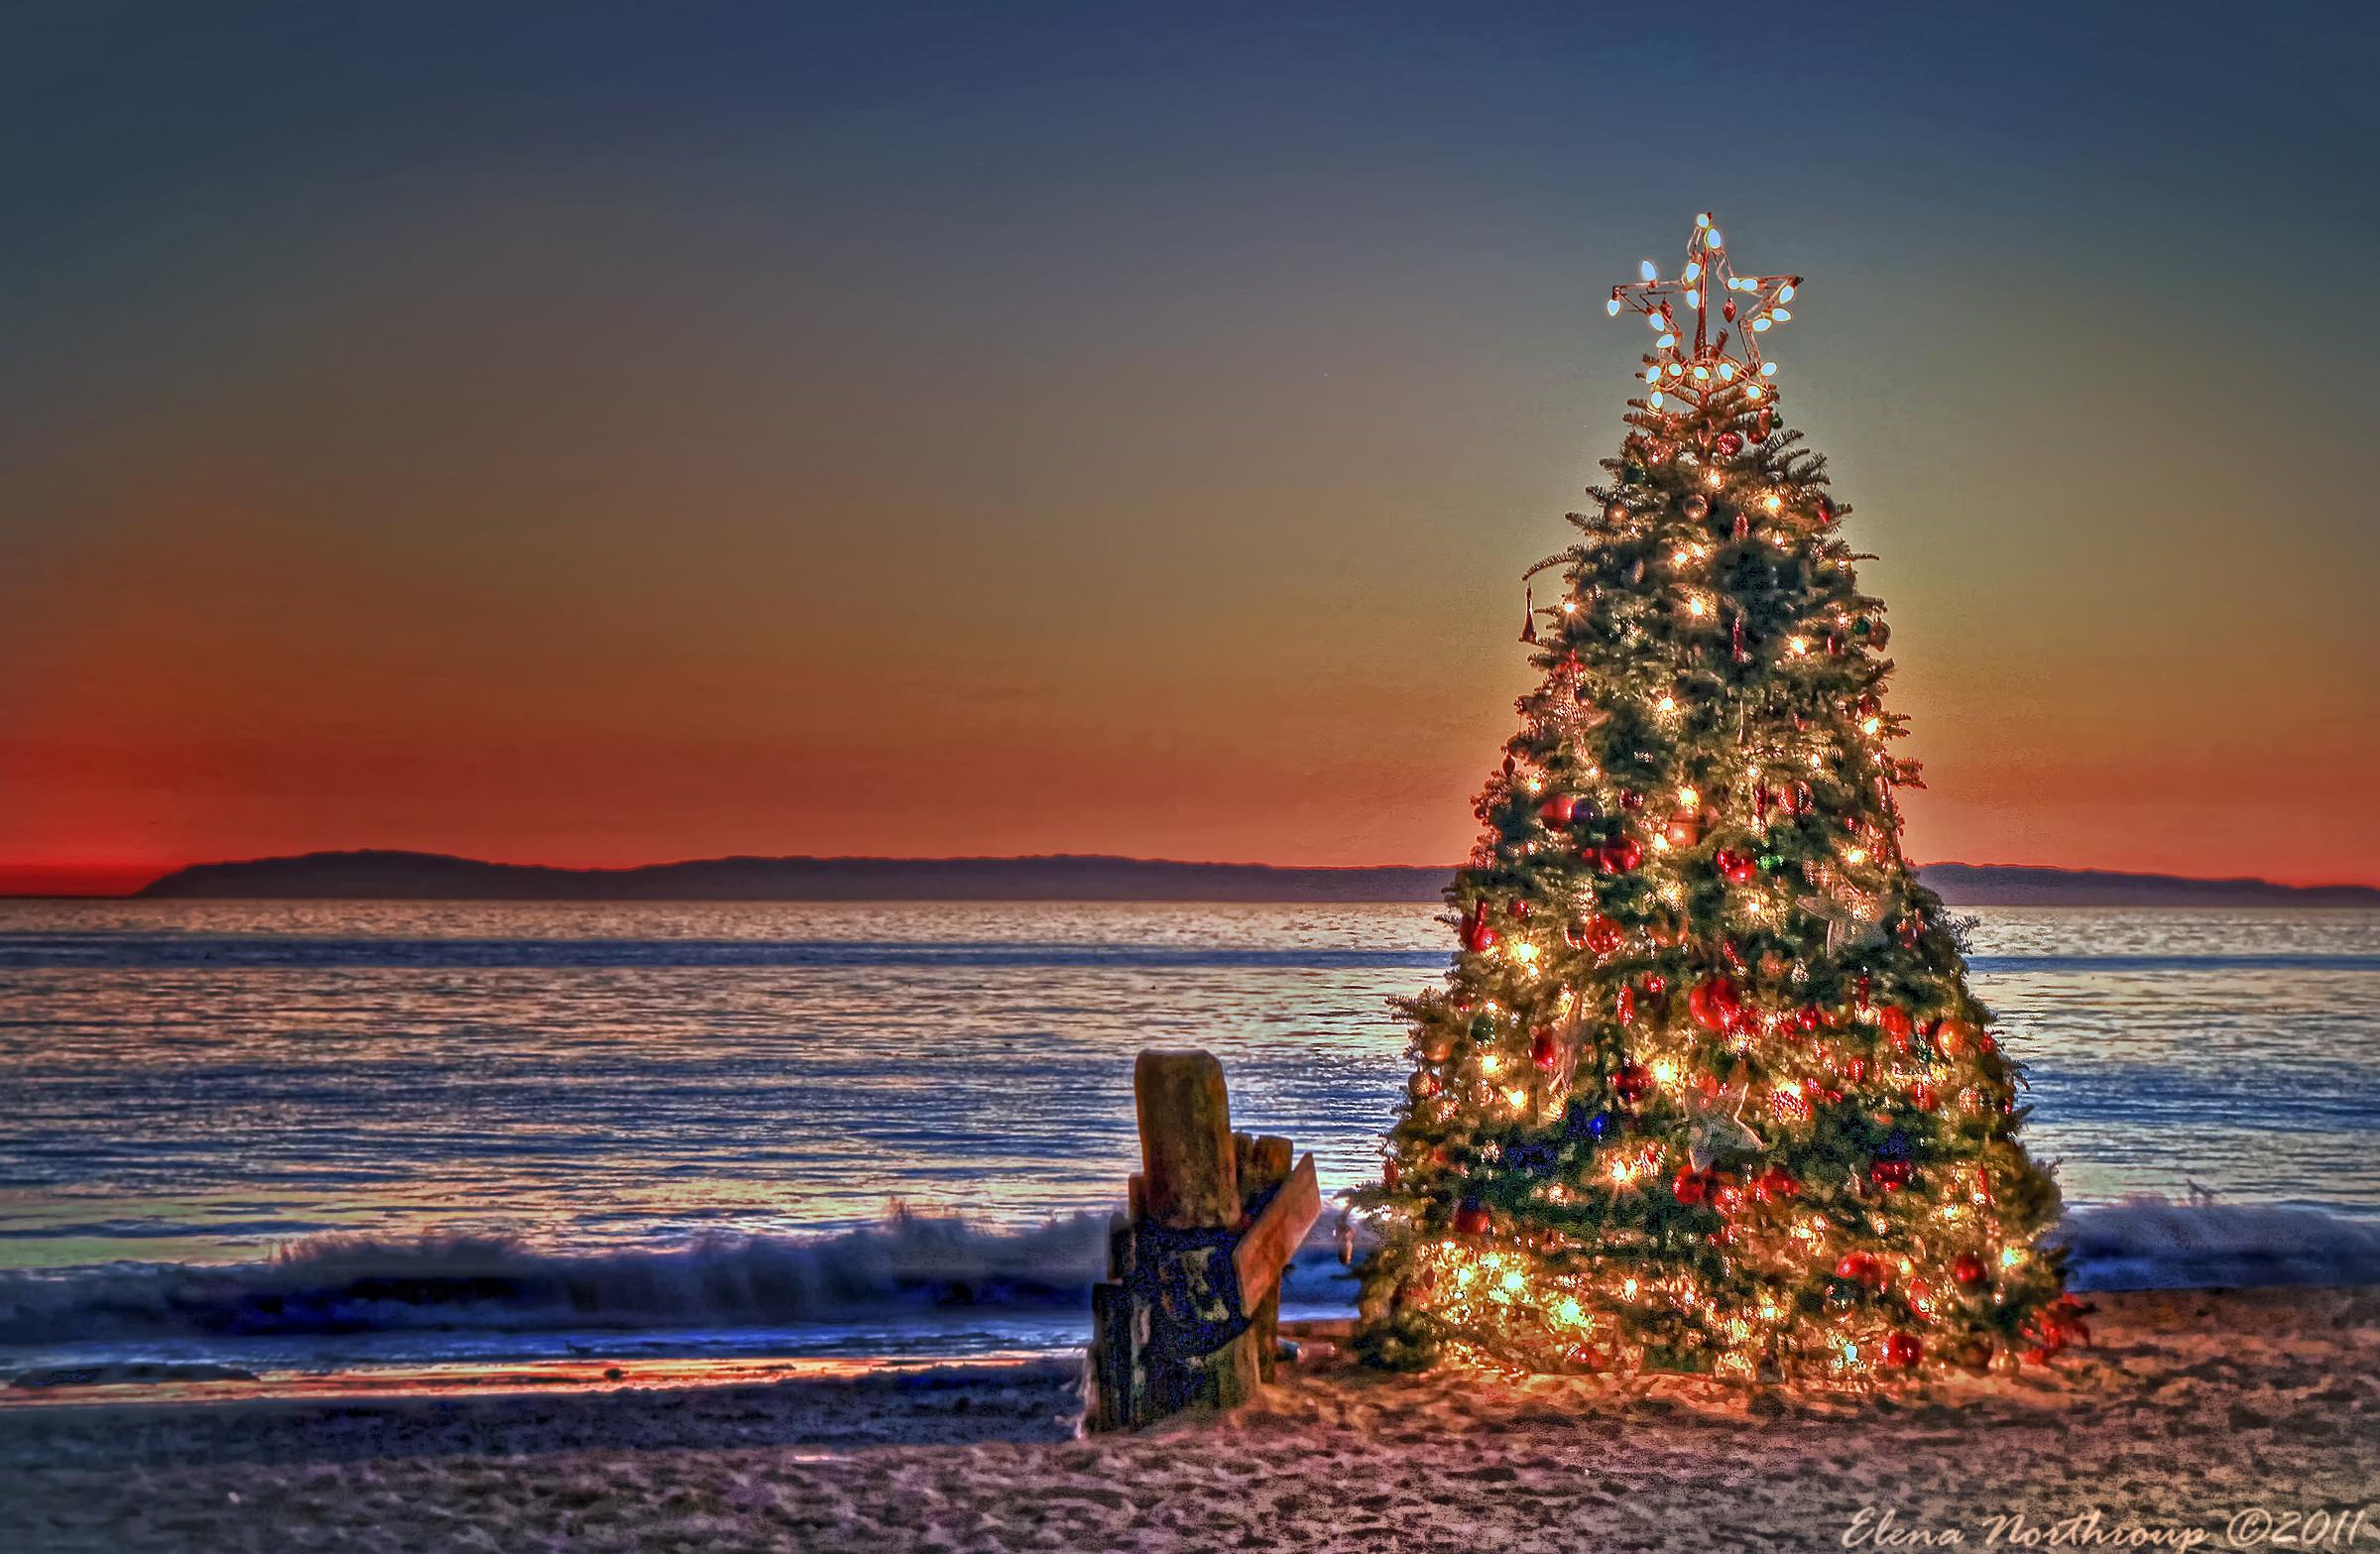 Good Christmas Tree At The Beach Part – 8: Christmas At The Beach